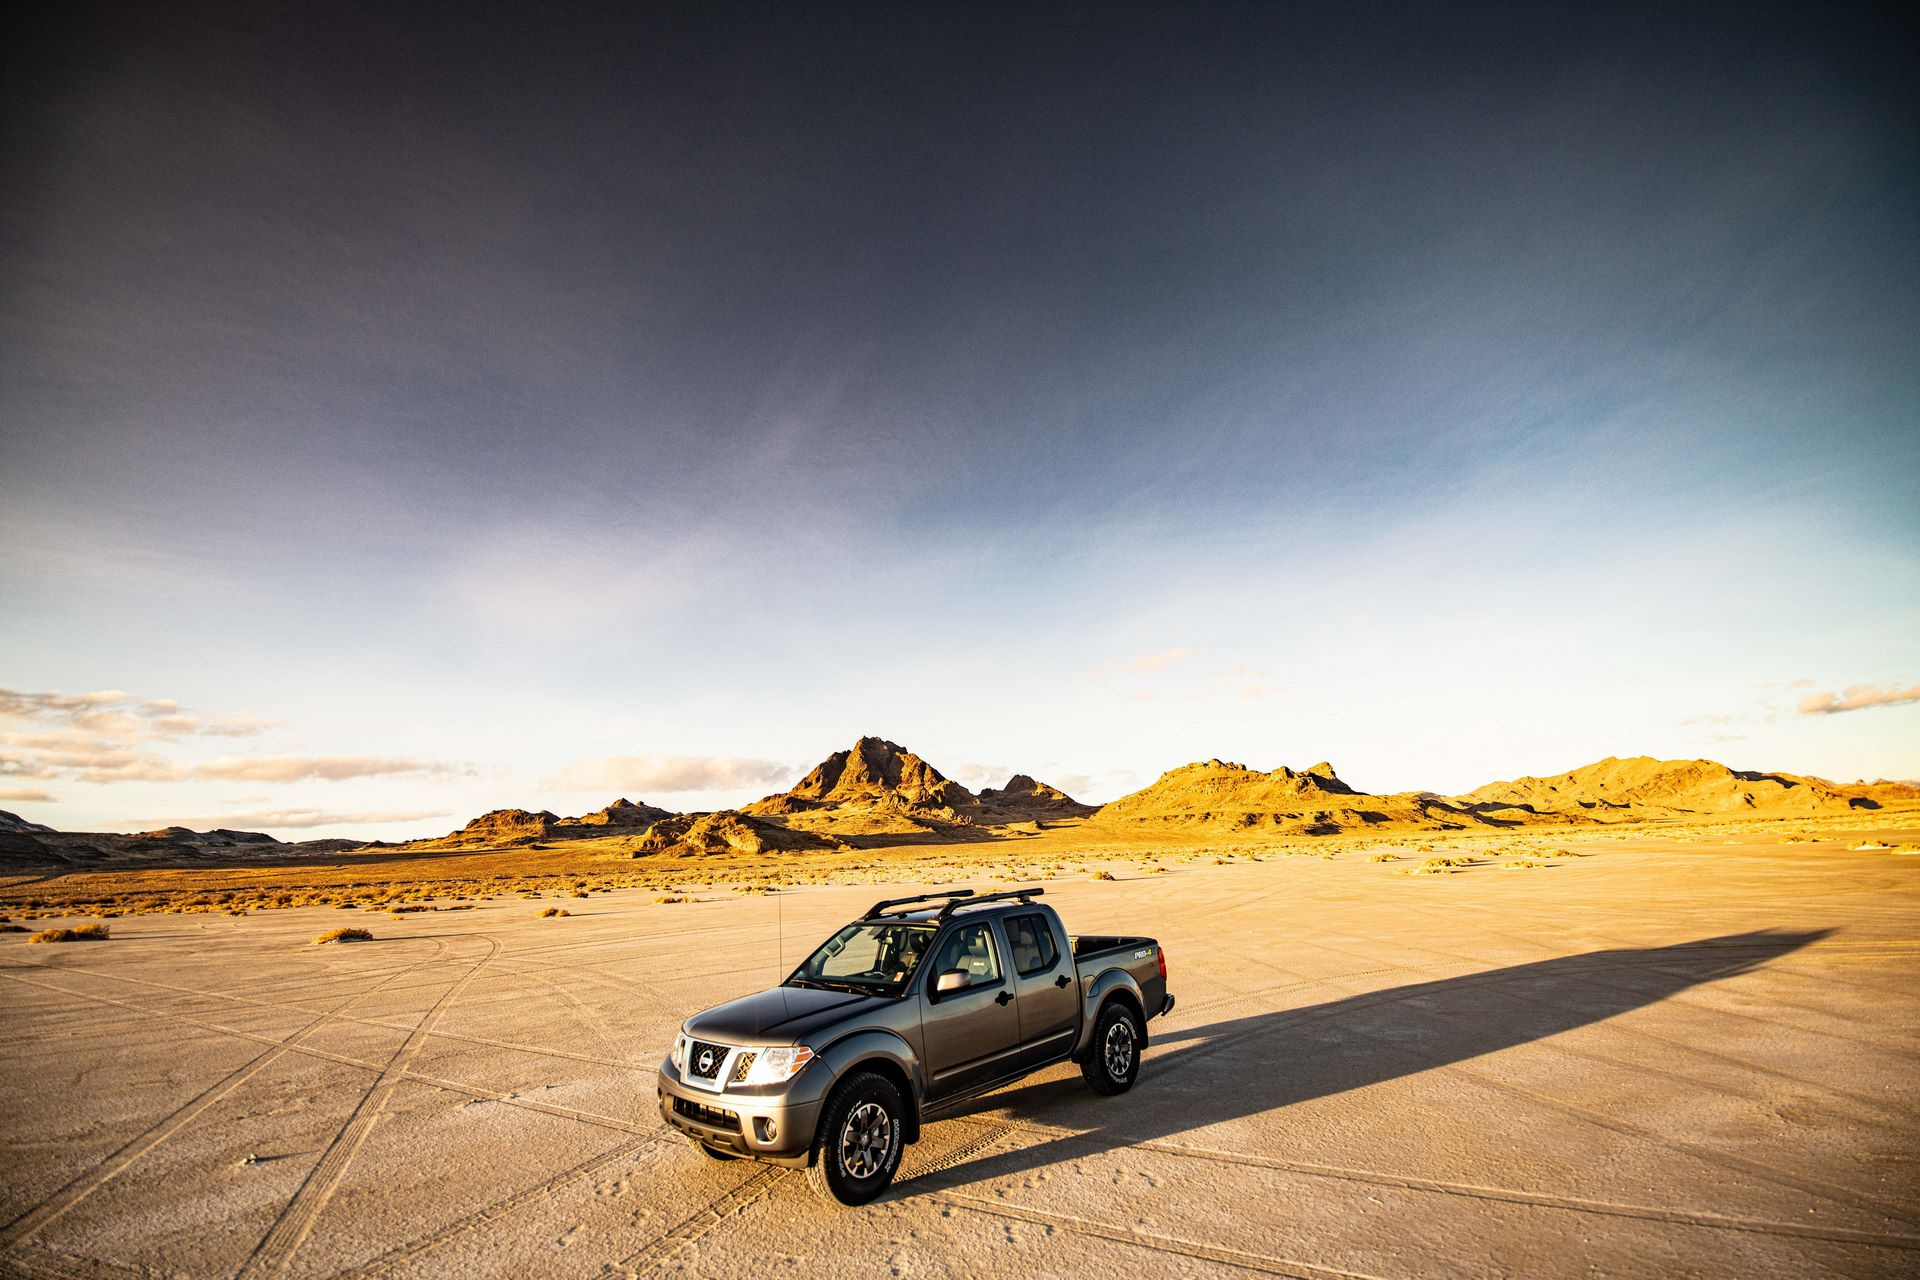 2020-Nissan-Frontier_sunset-4